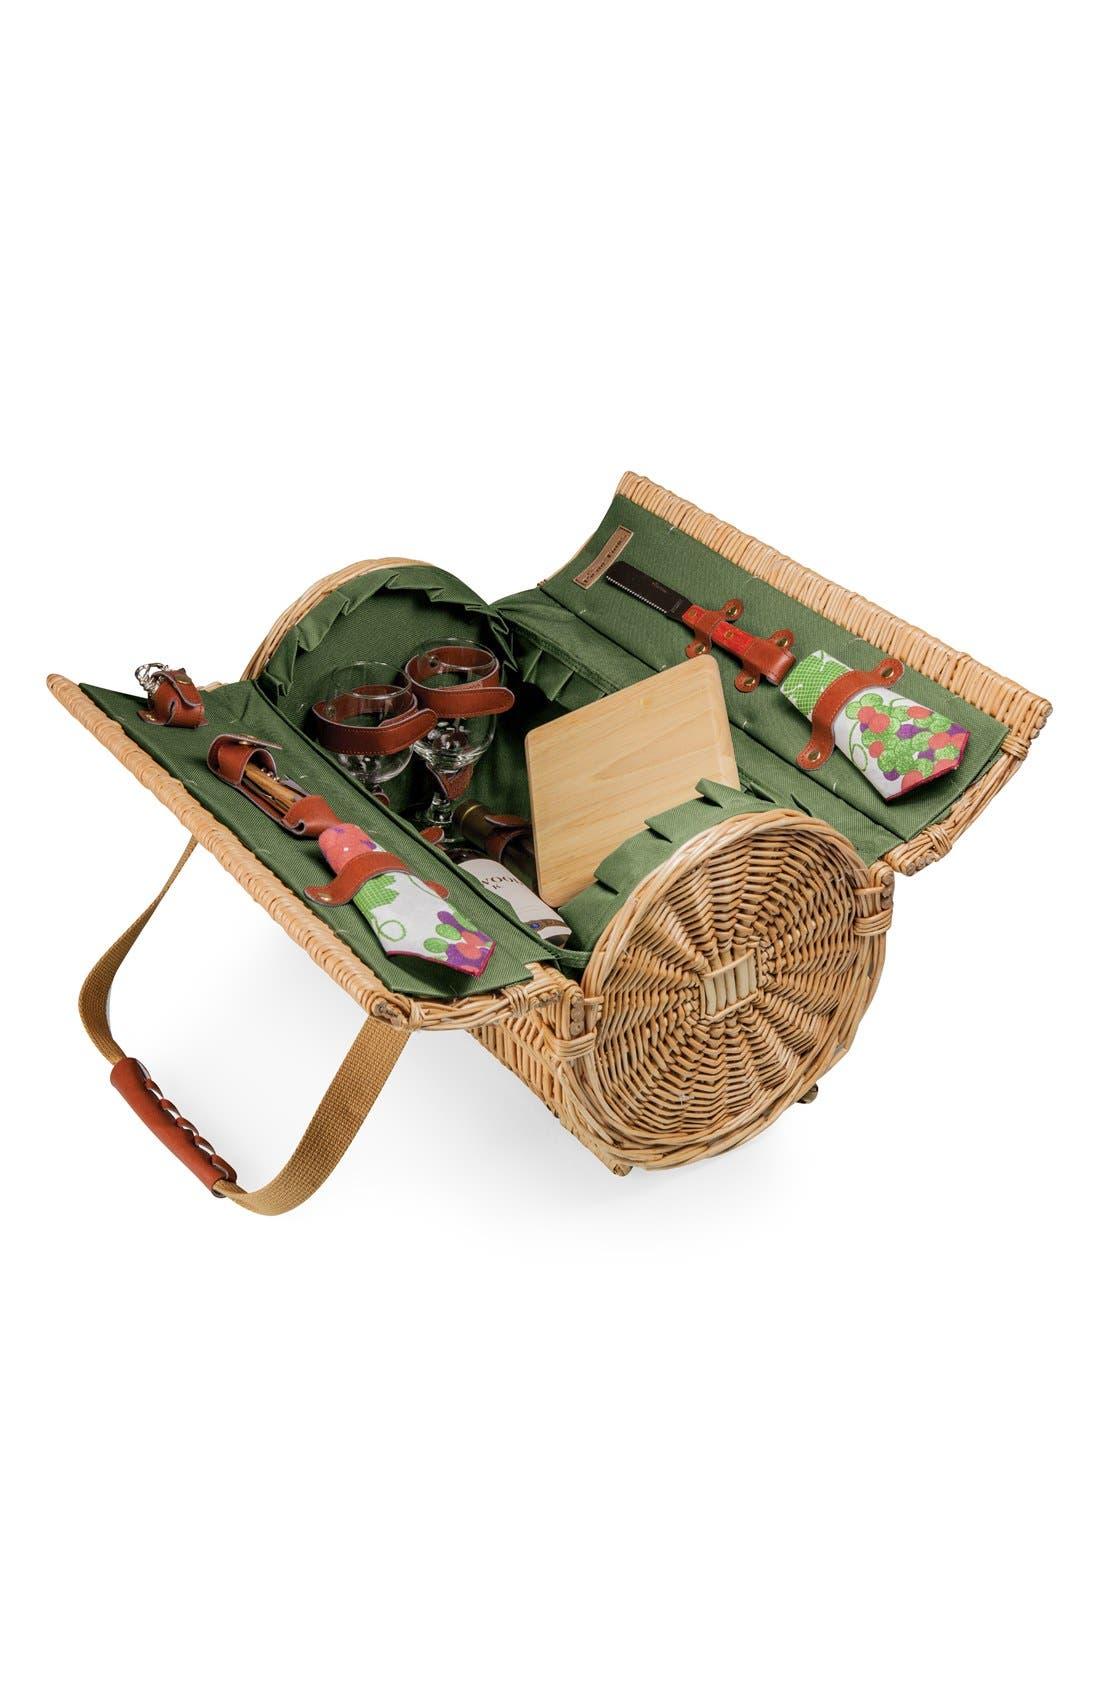 Alternate Image 1 Selected - Picnic Time 'Verona' Wicker Picnic Basket